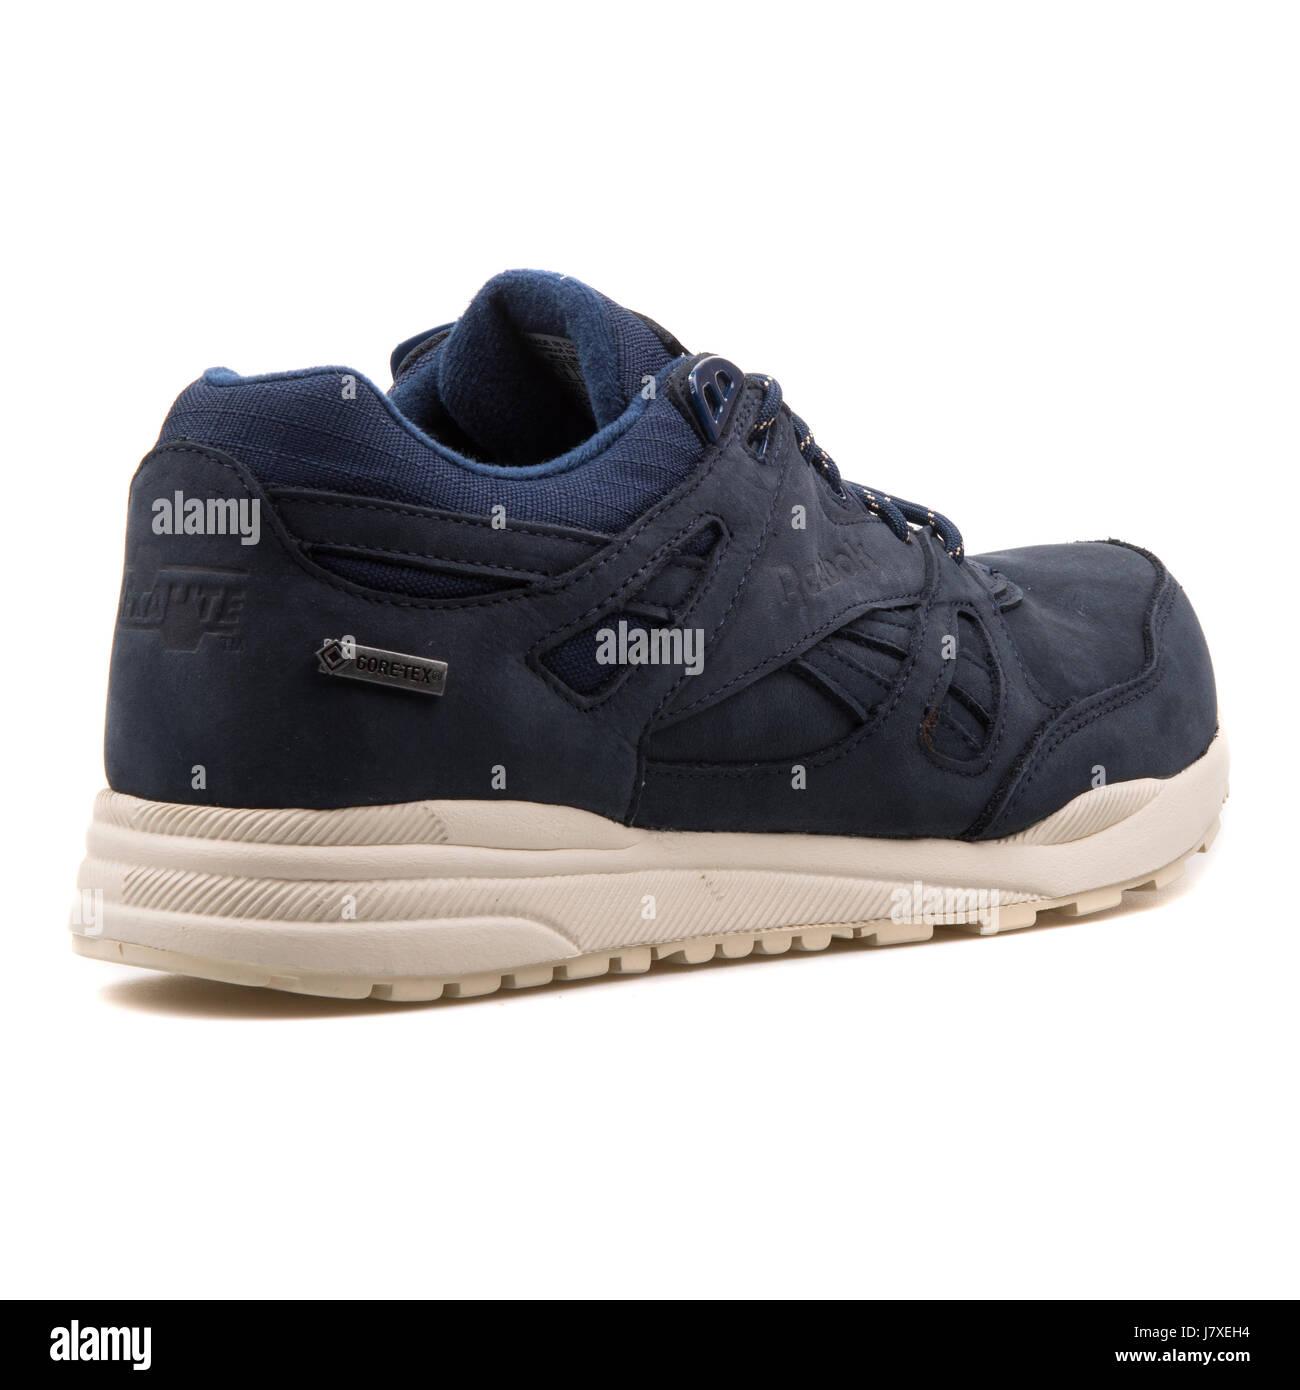 f79cddf99f77 ... Reebok Ventilator Goretex Mens Classic Indigo Blue Walnut Leather  Sneakers - V66308 . ...